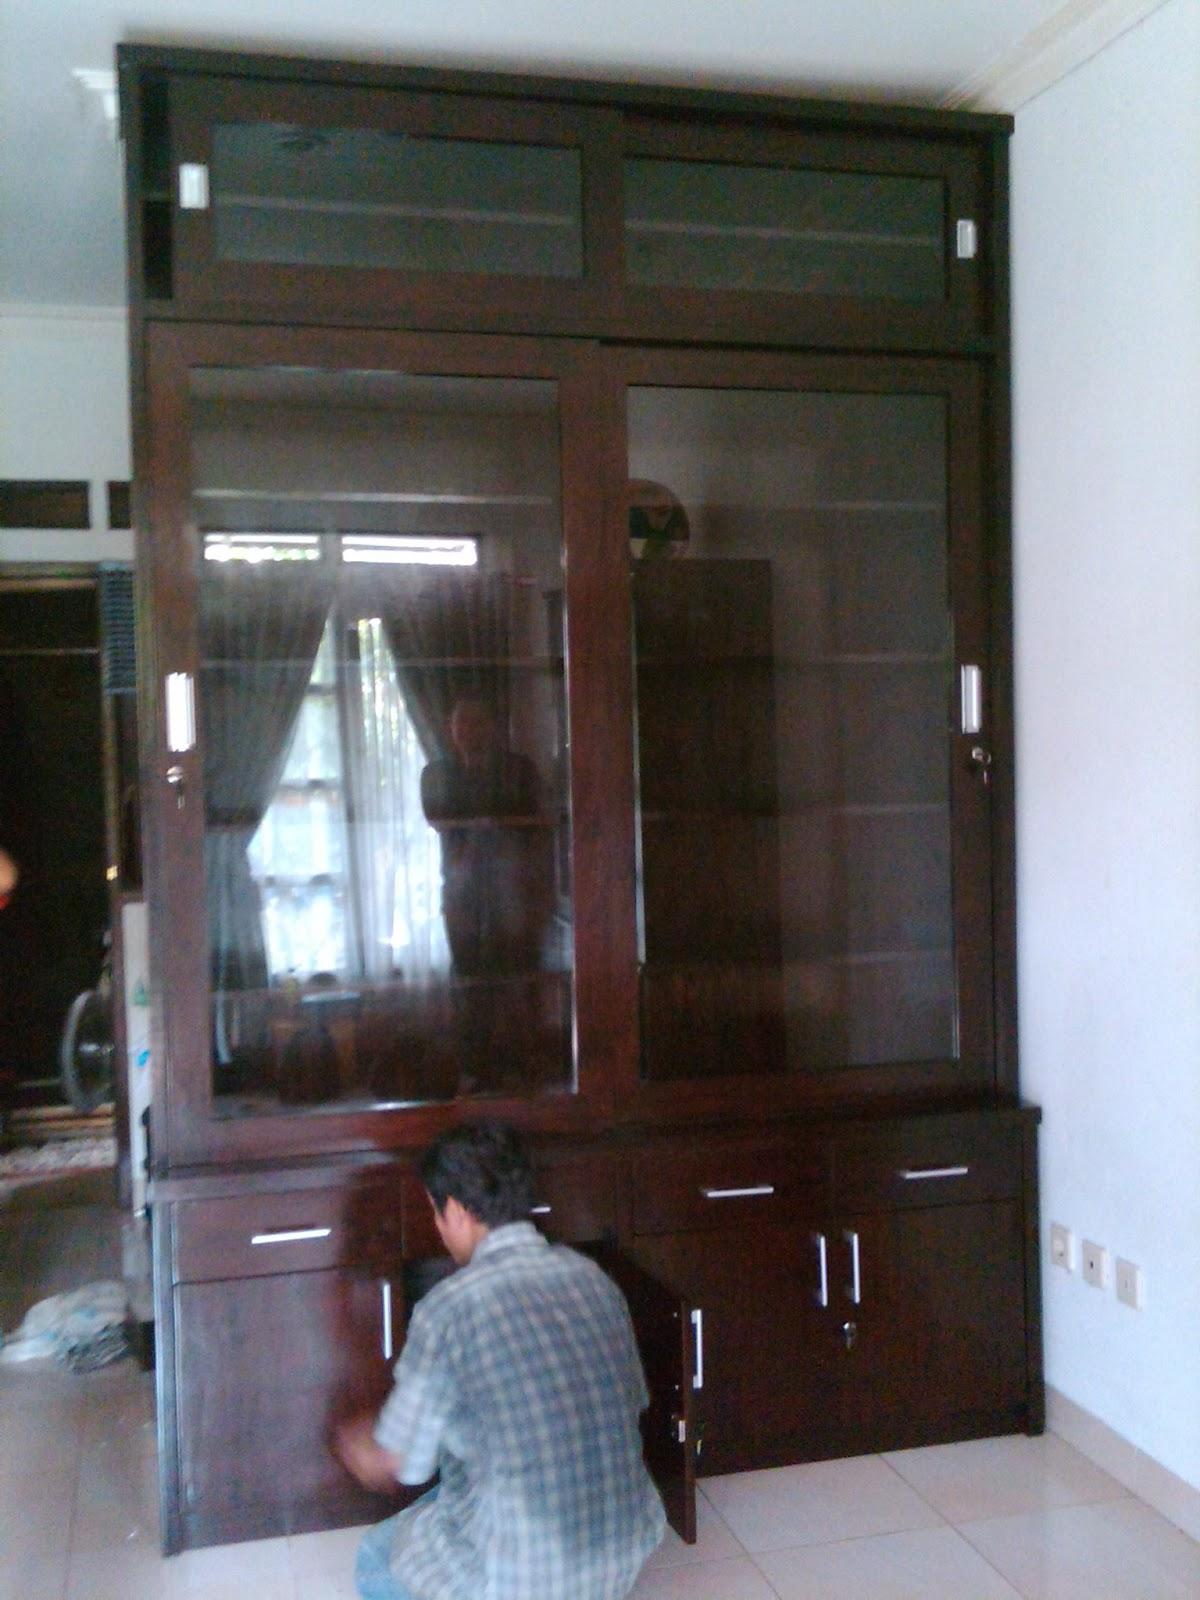 Satria Furniture Depok 11 06 13